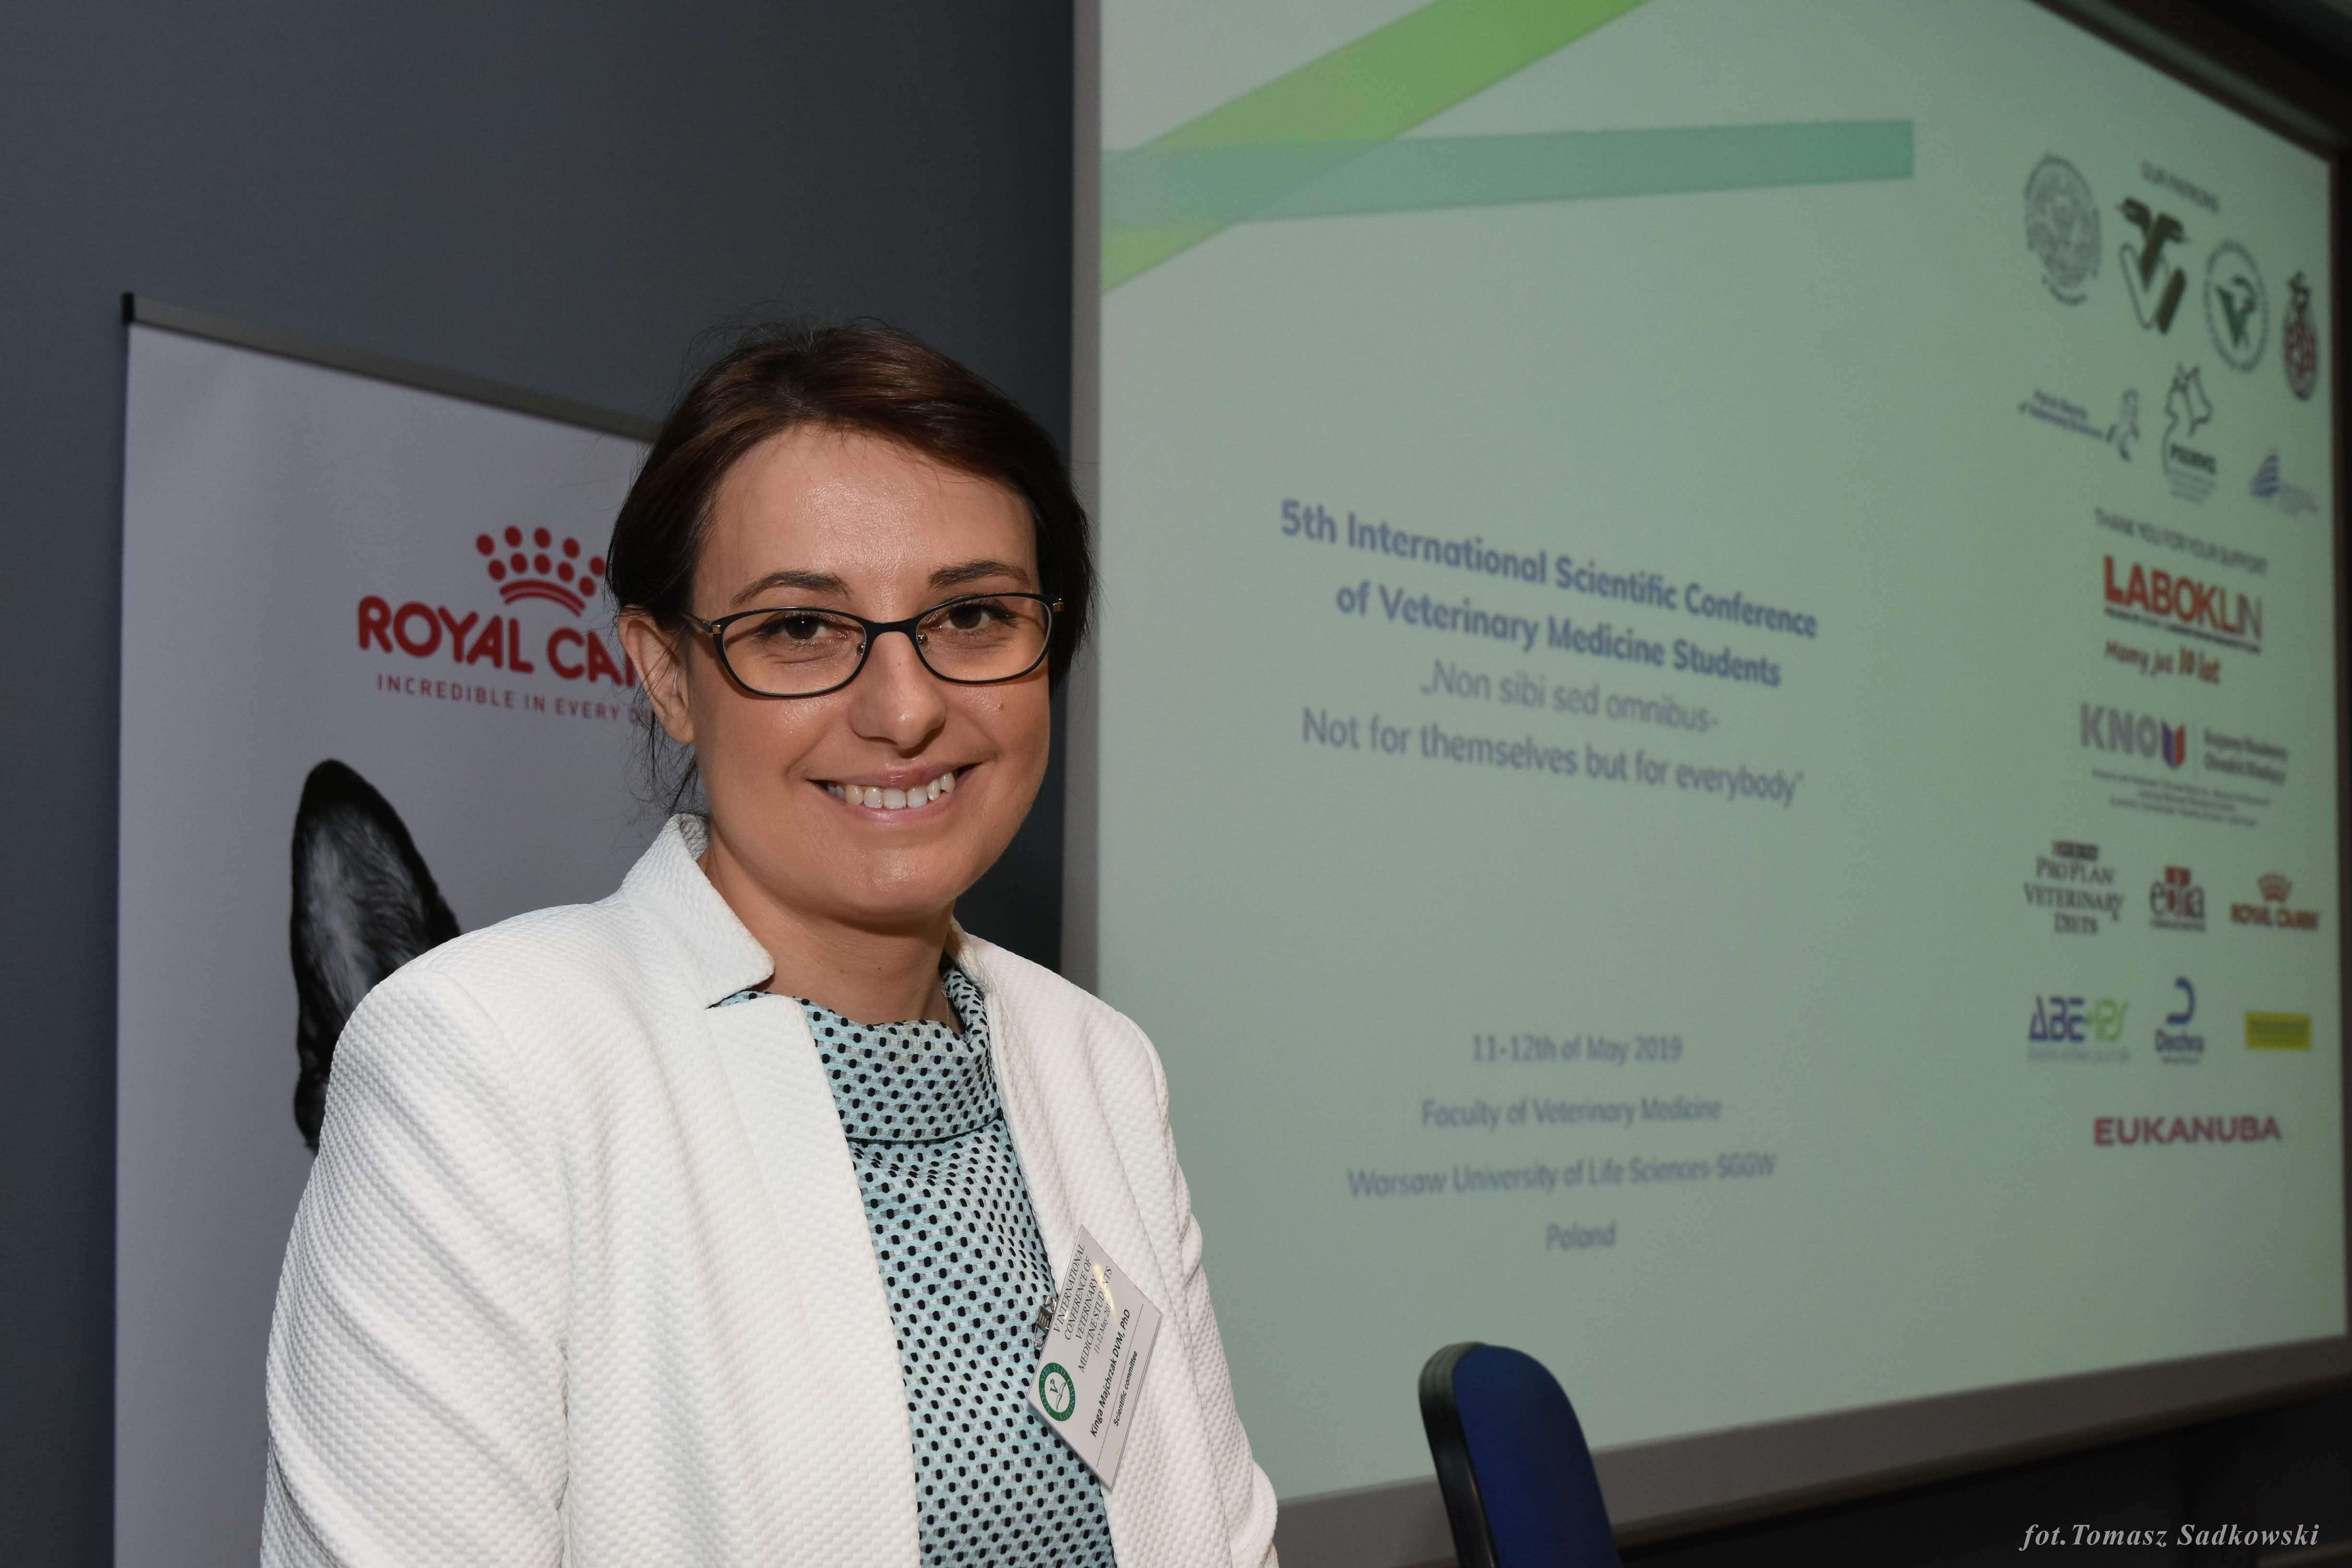 Dr Majchrzak during lecture